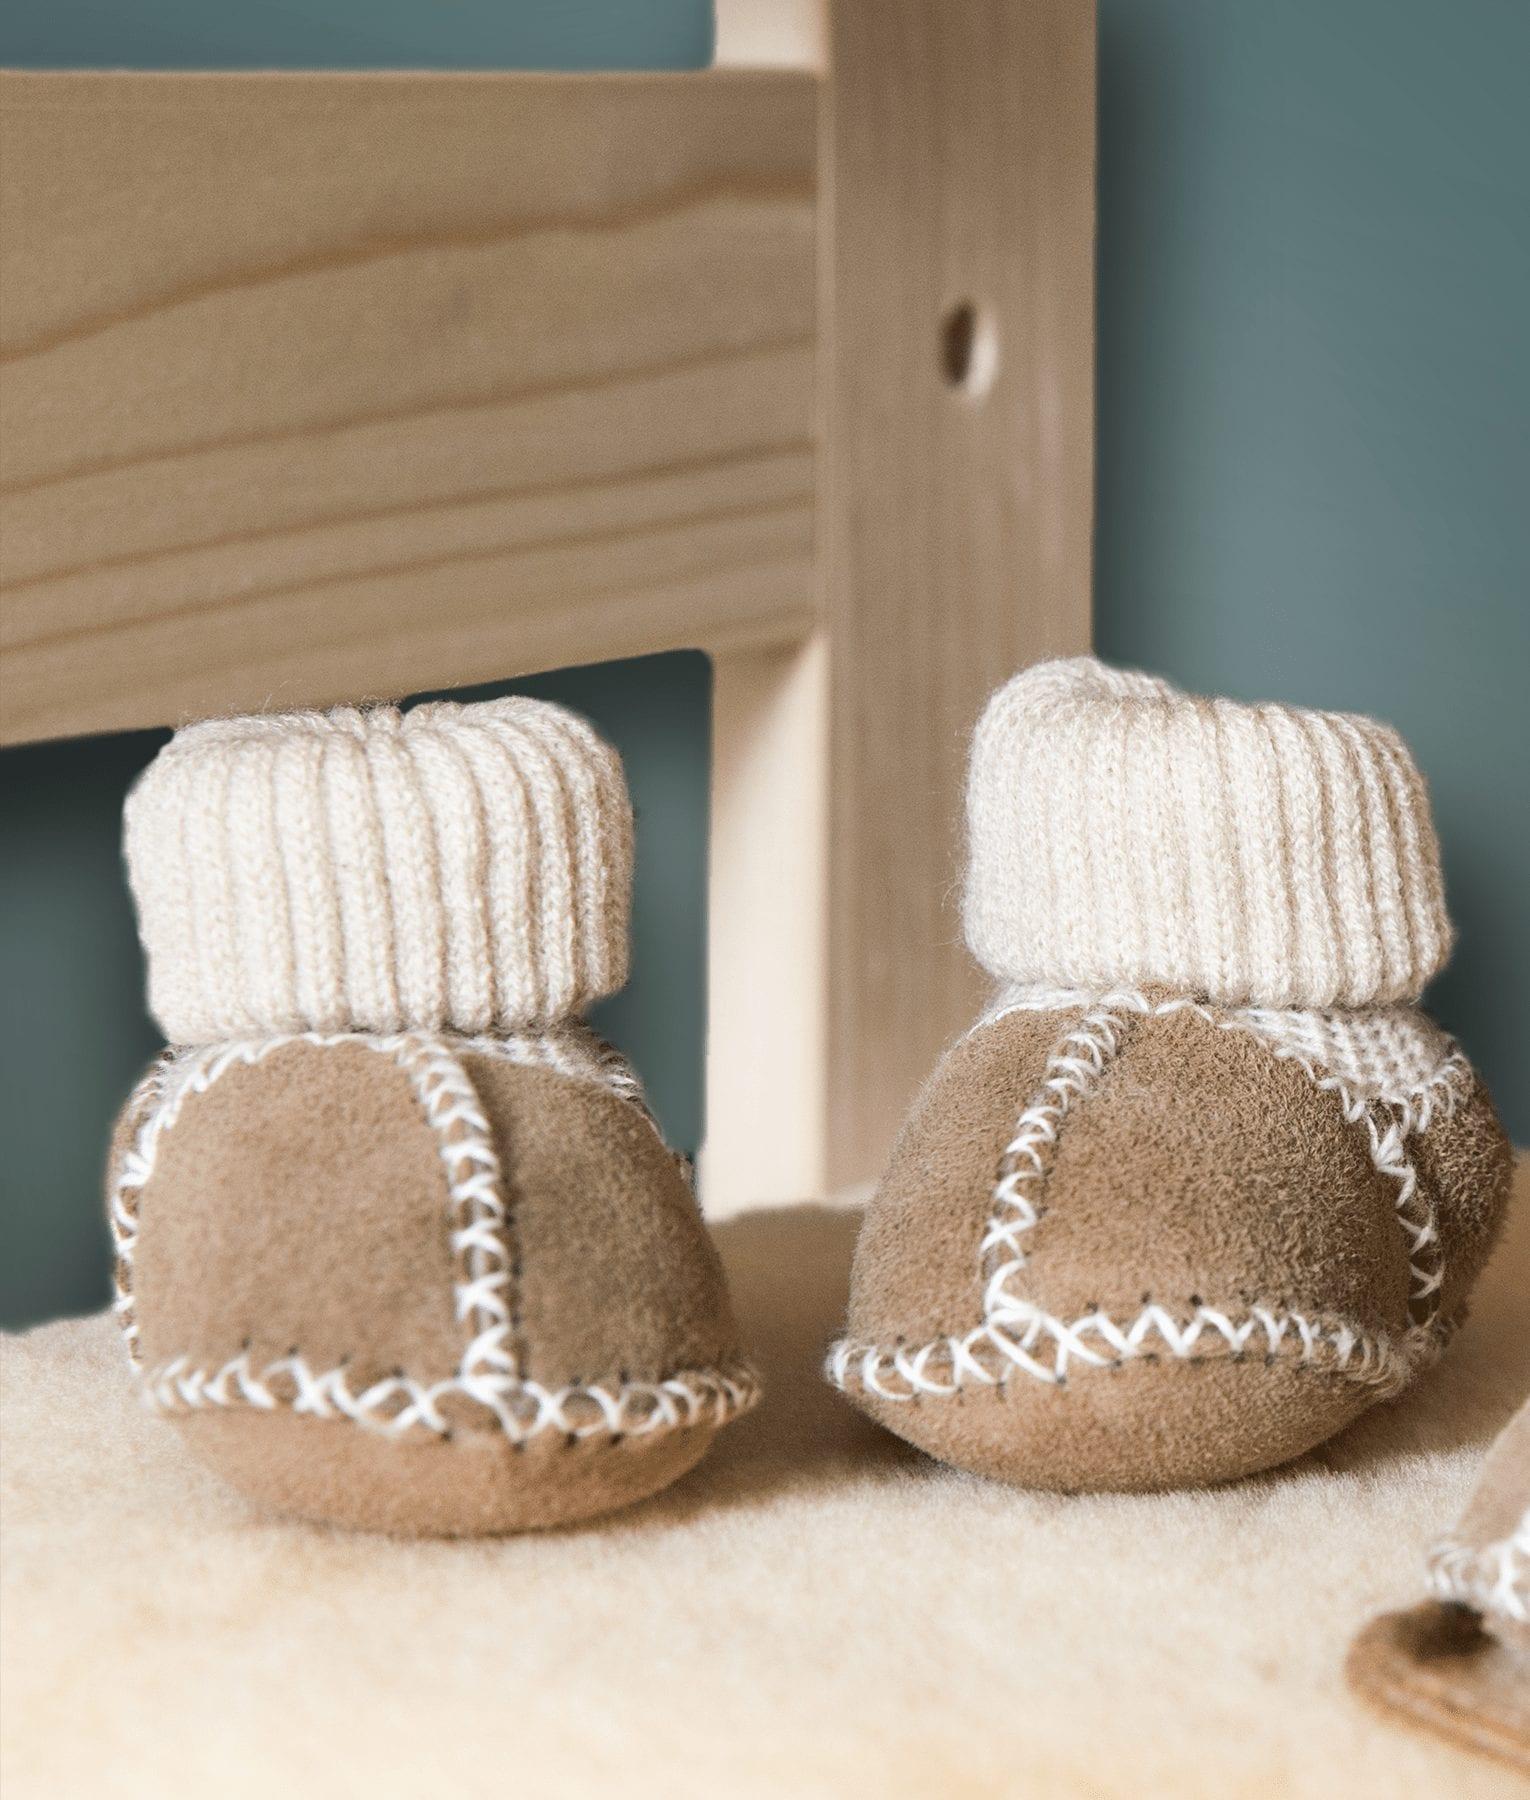 lambskin-baby-shoes